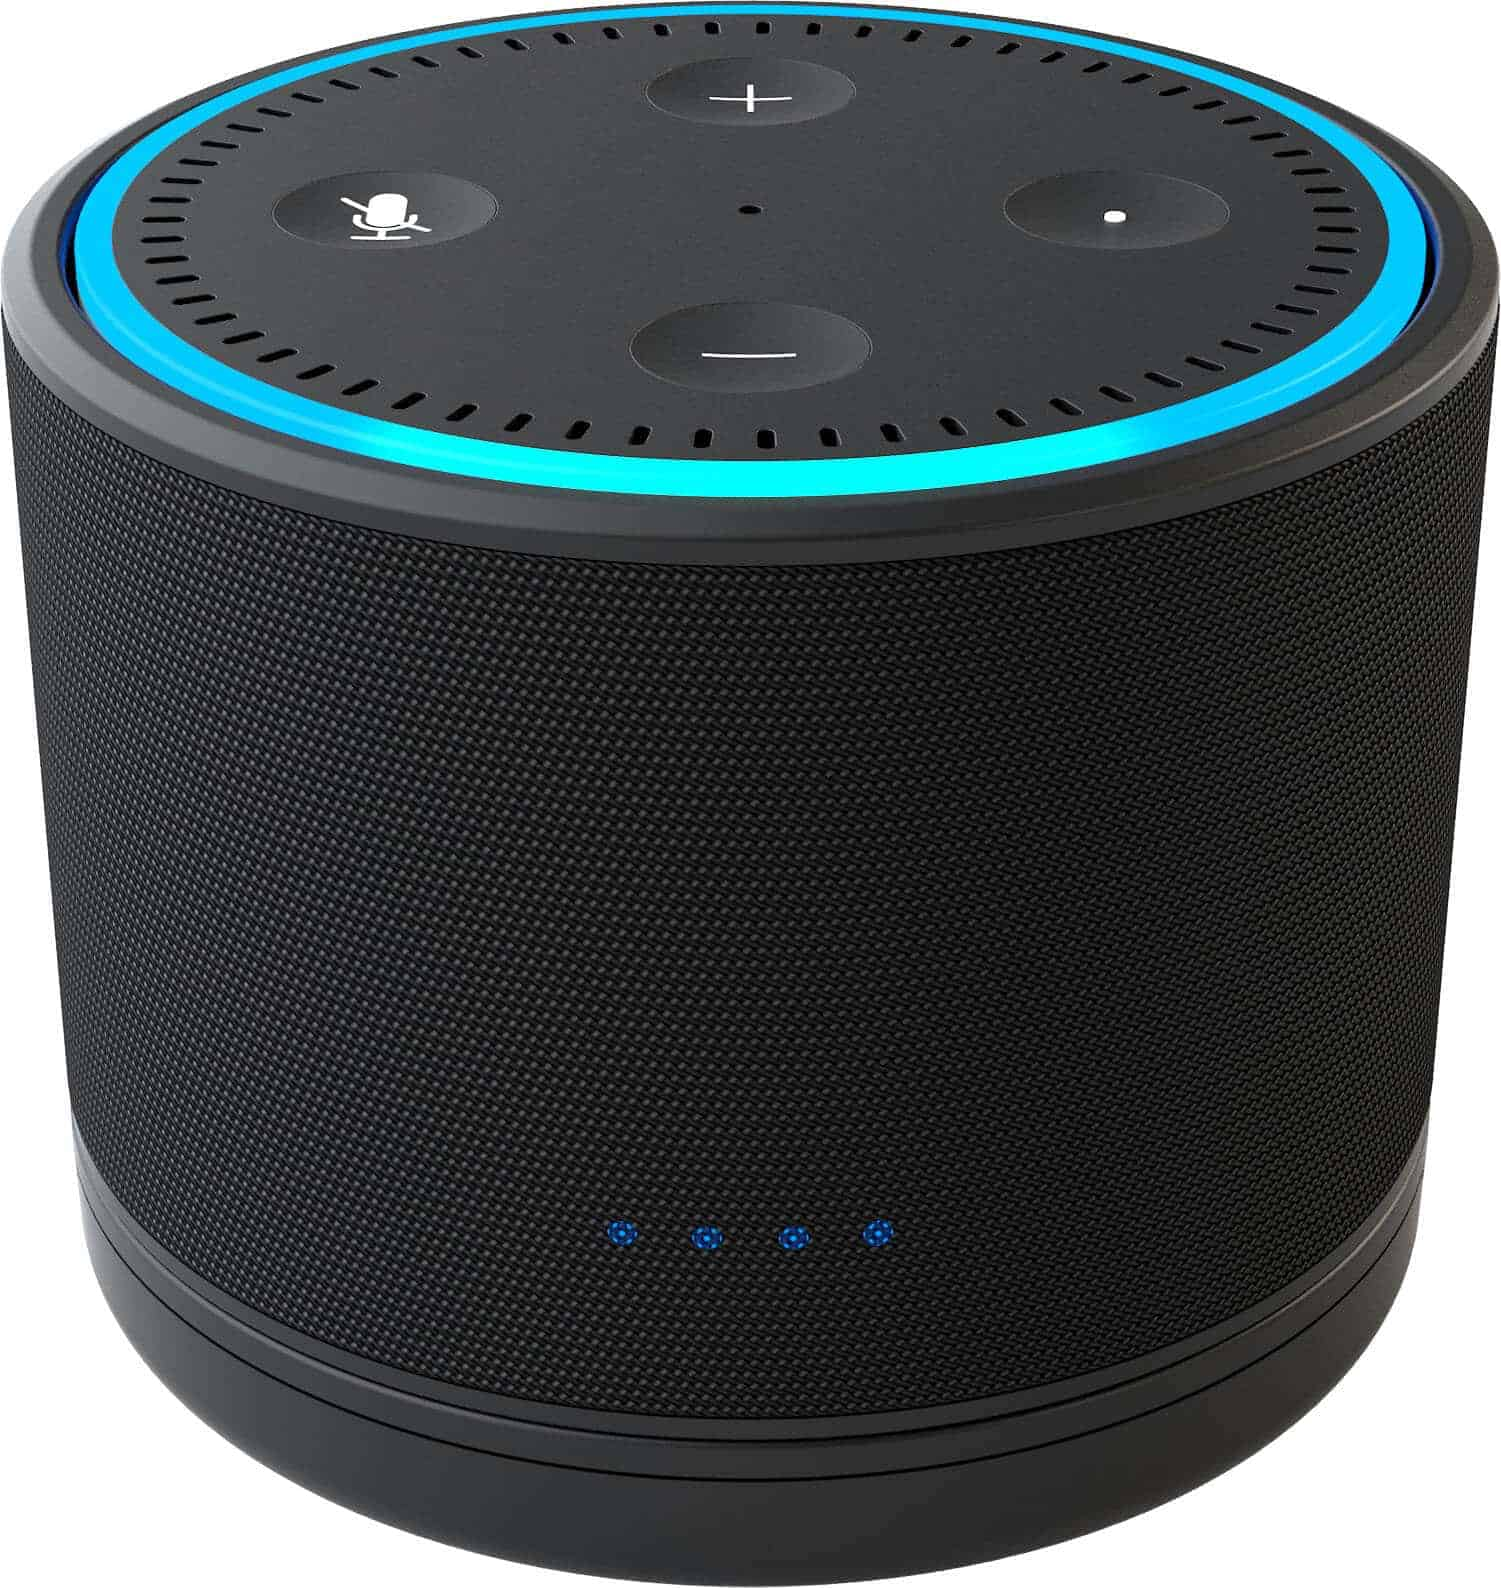 DOX Battery Base For Echo Dot 4